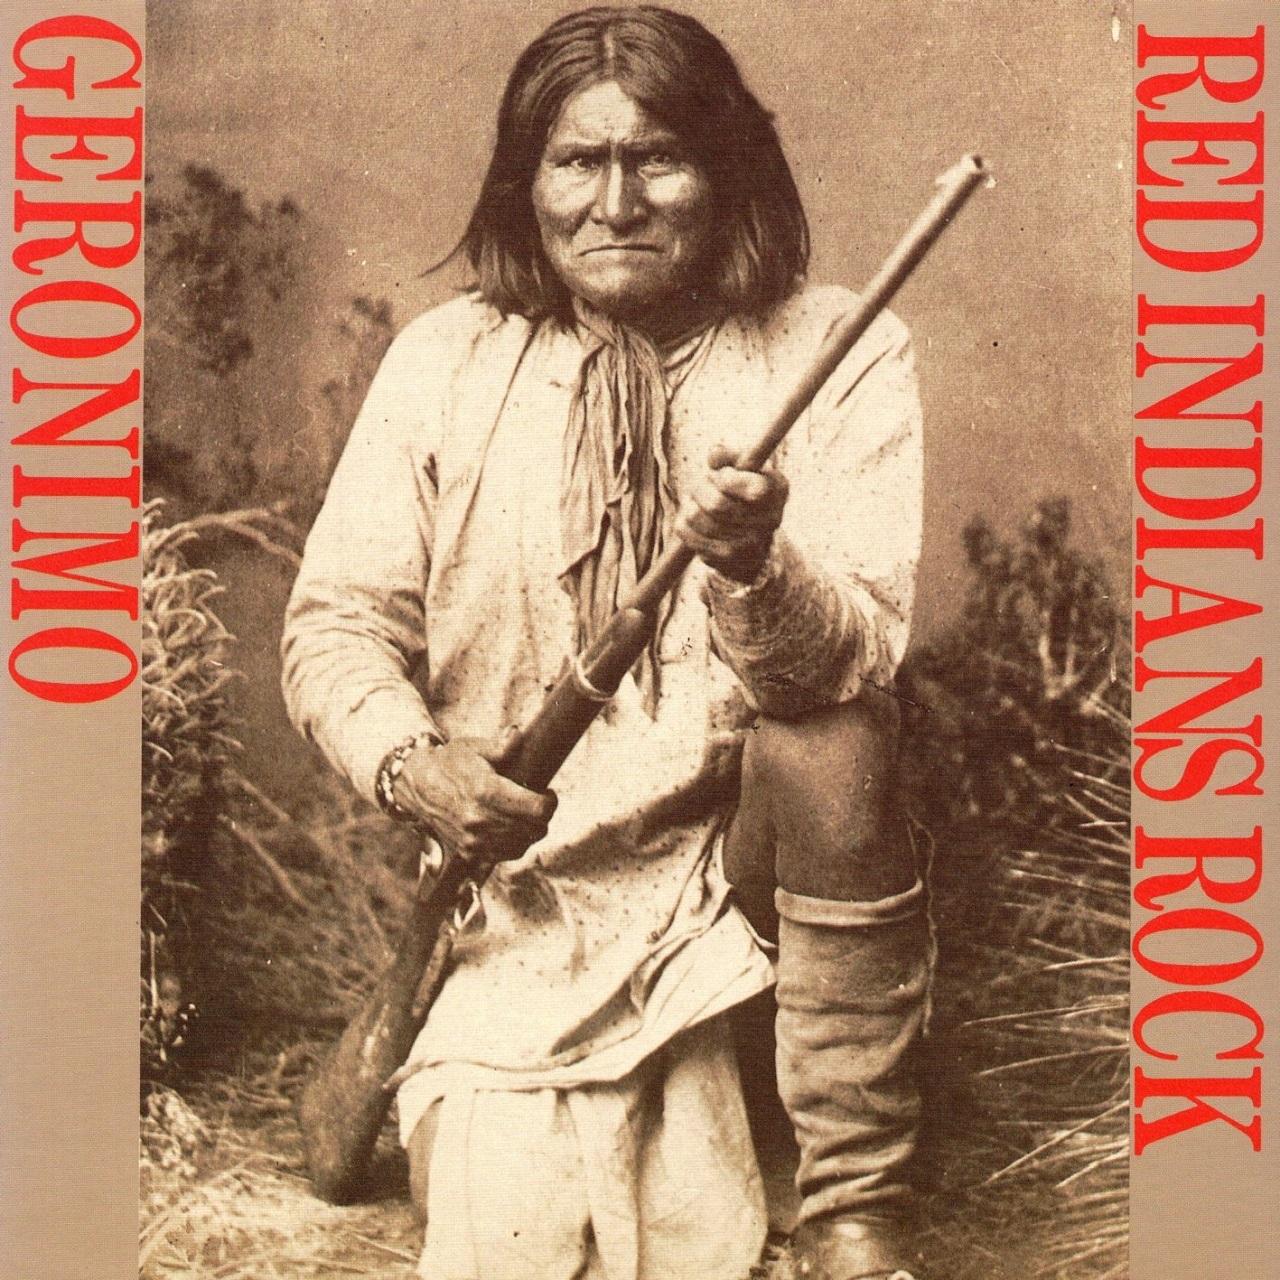 【7inch・国内盤】ガスタンク / Geronimo